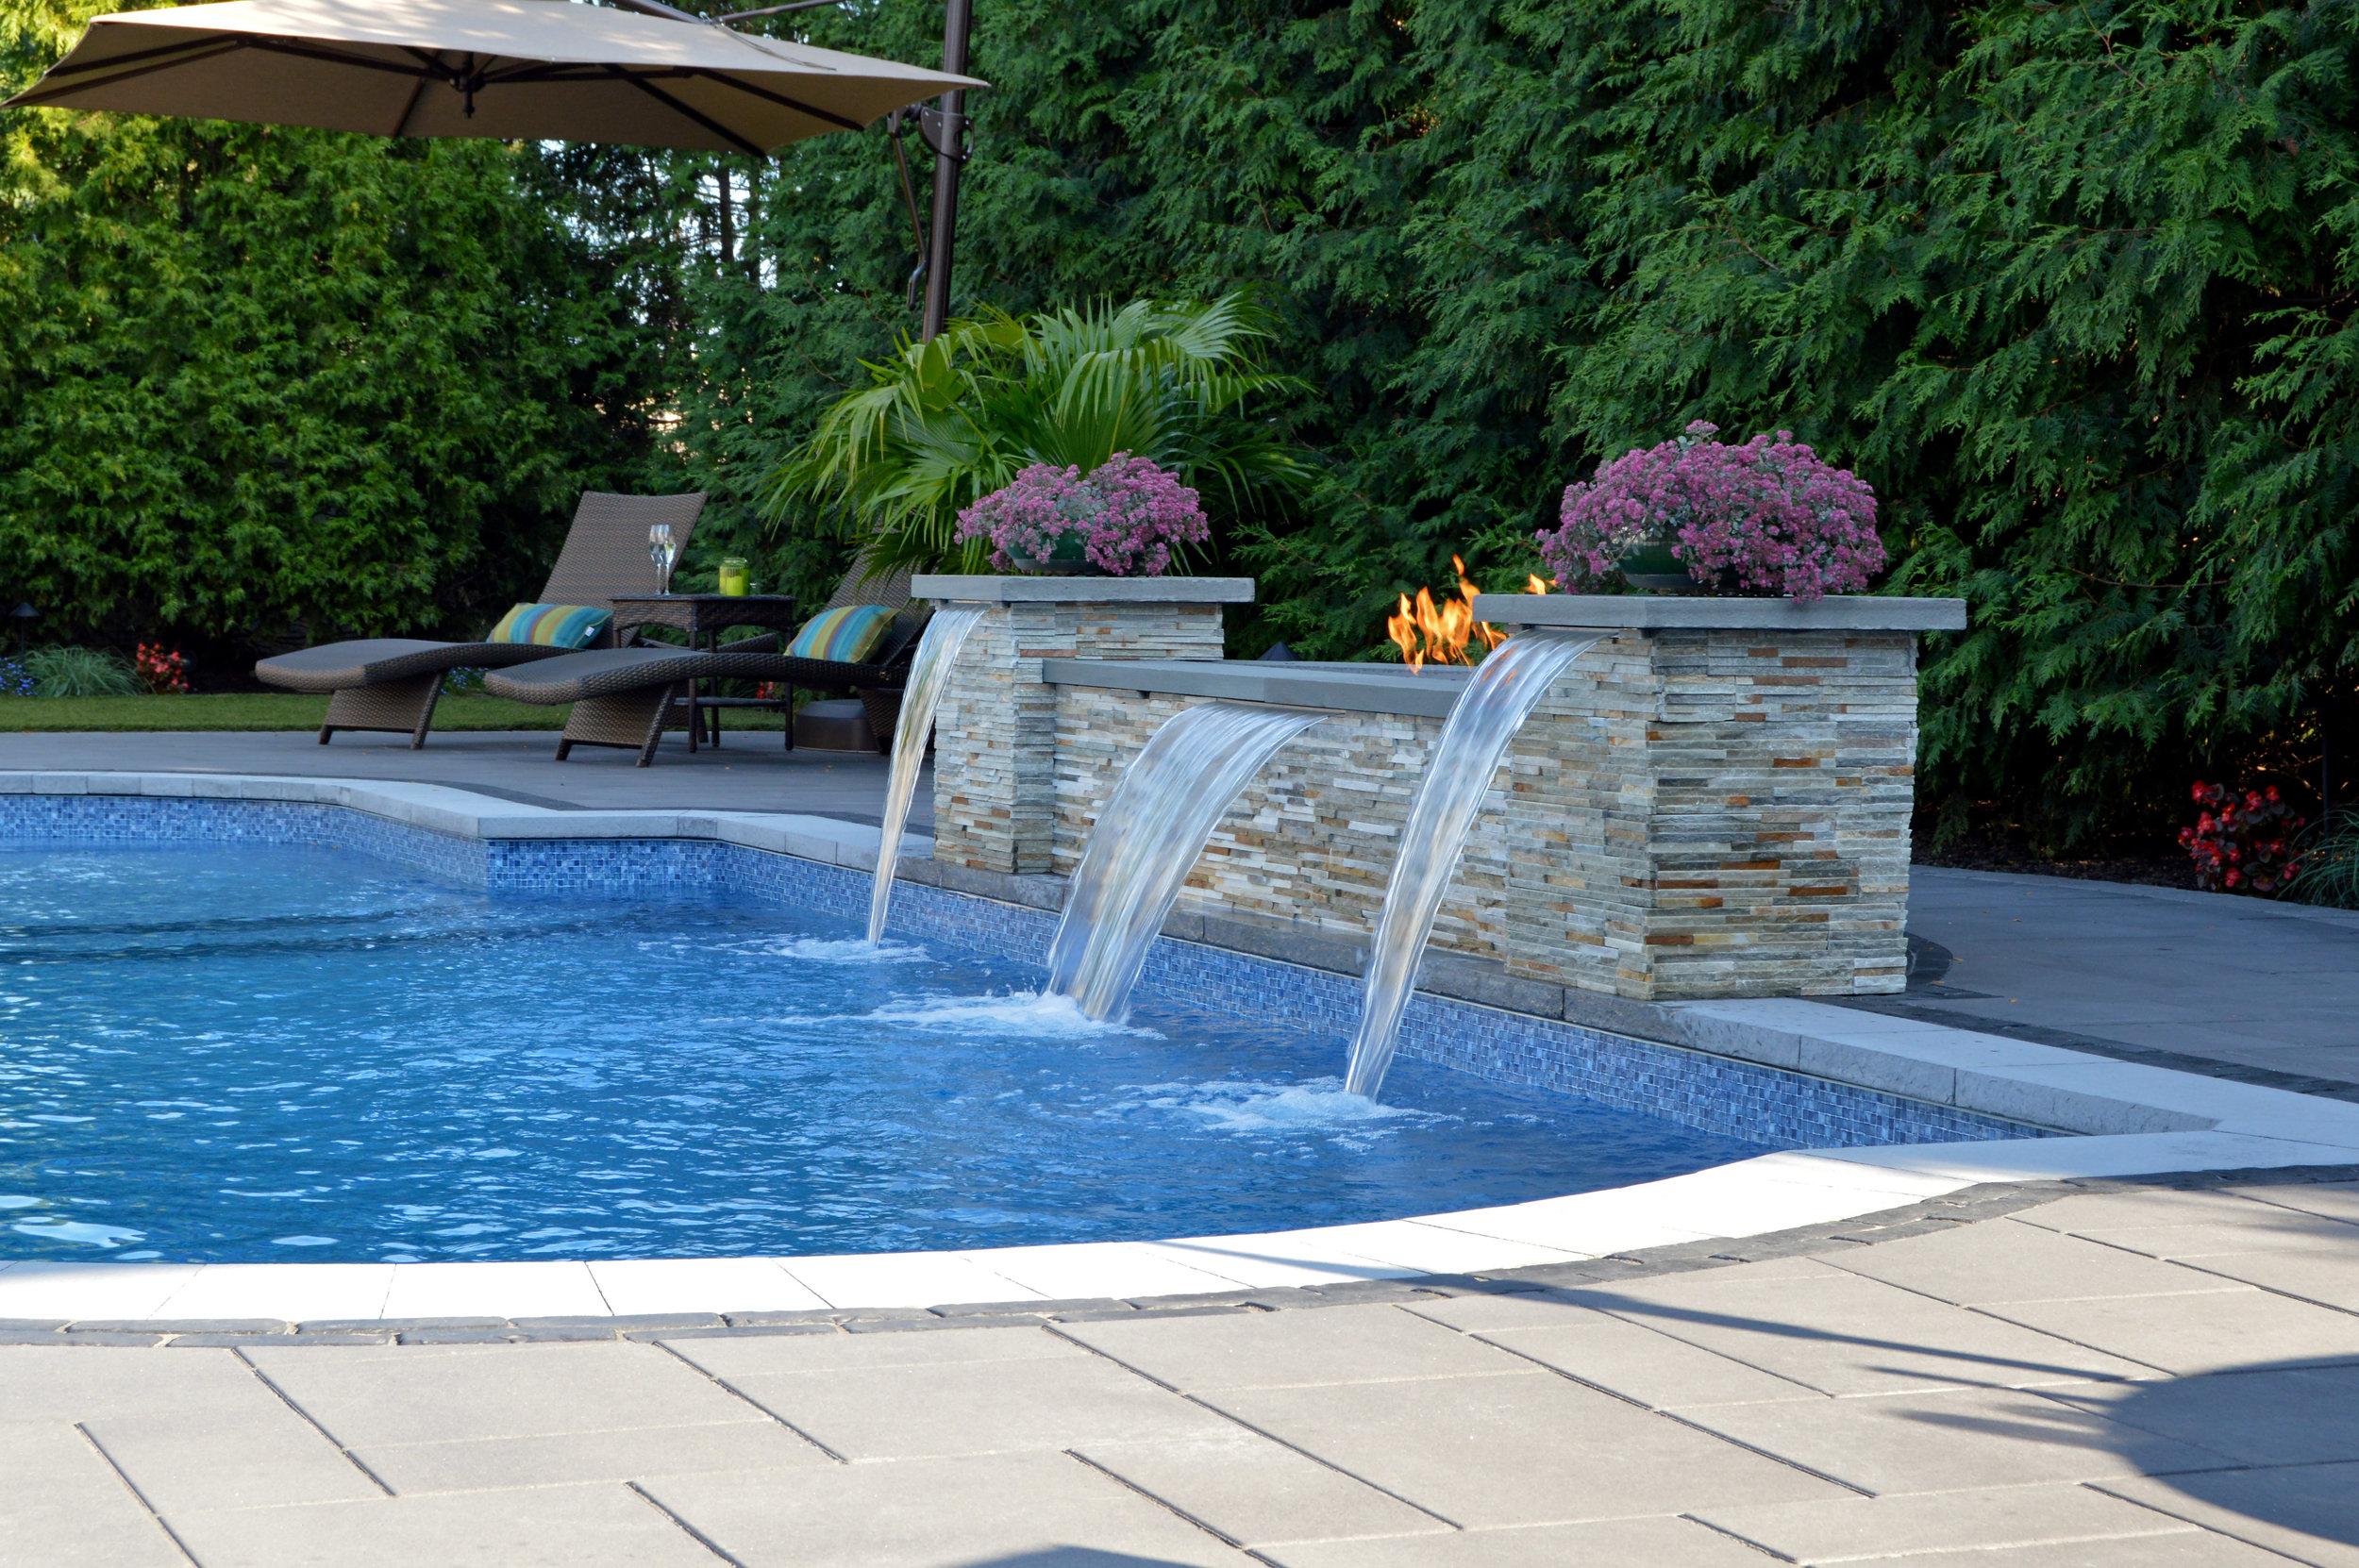 hicksville, NY swimming pool waterfall